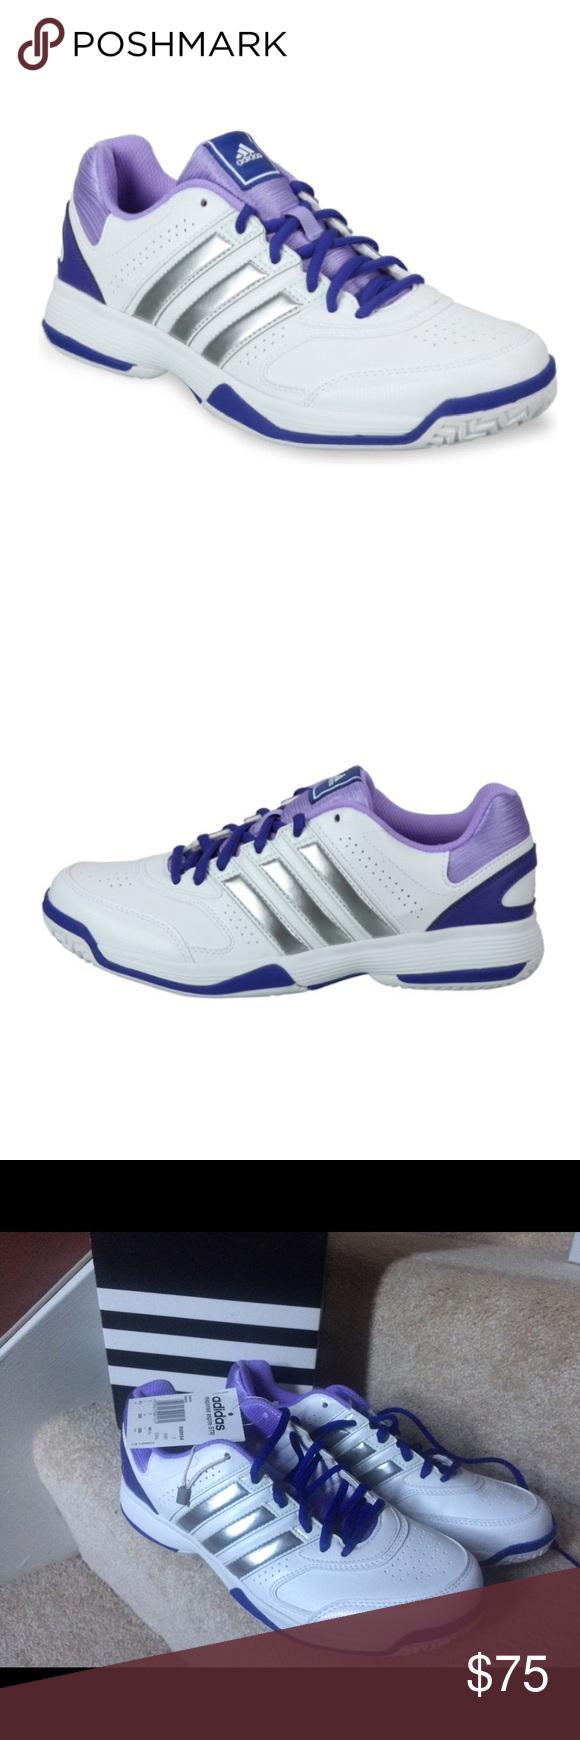 New Adidas response aspire str Women Tennis Shoes Brand new in box ...